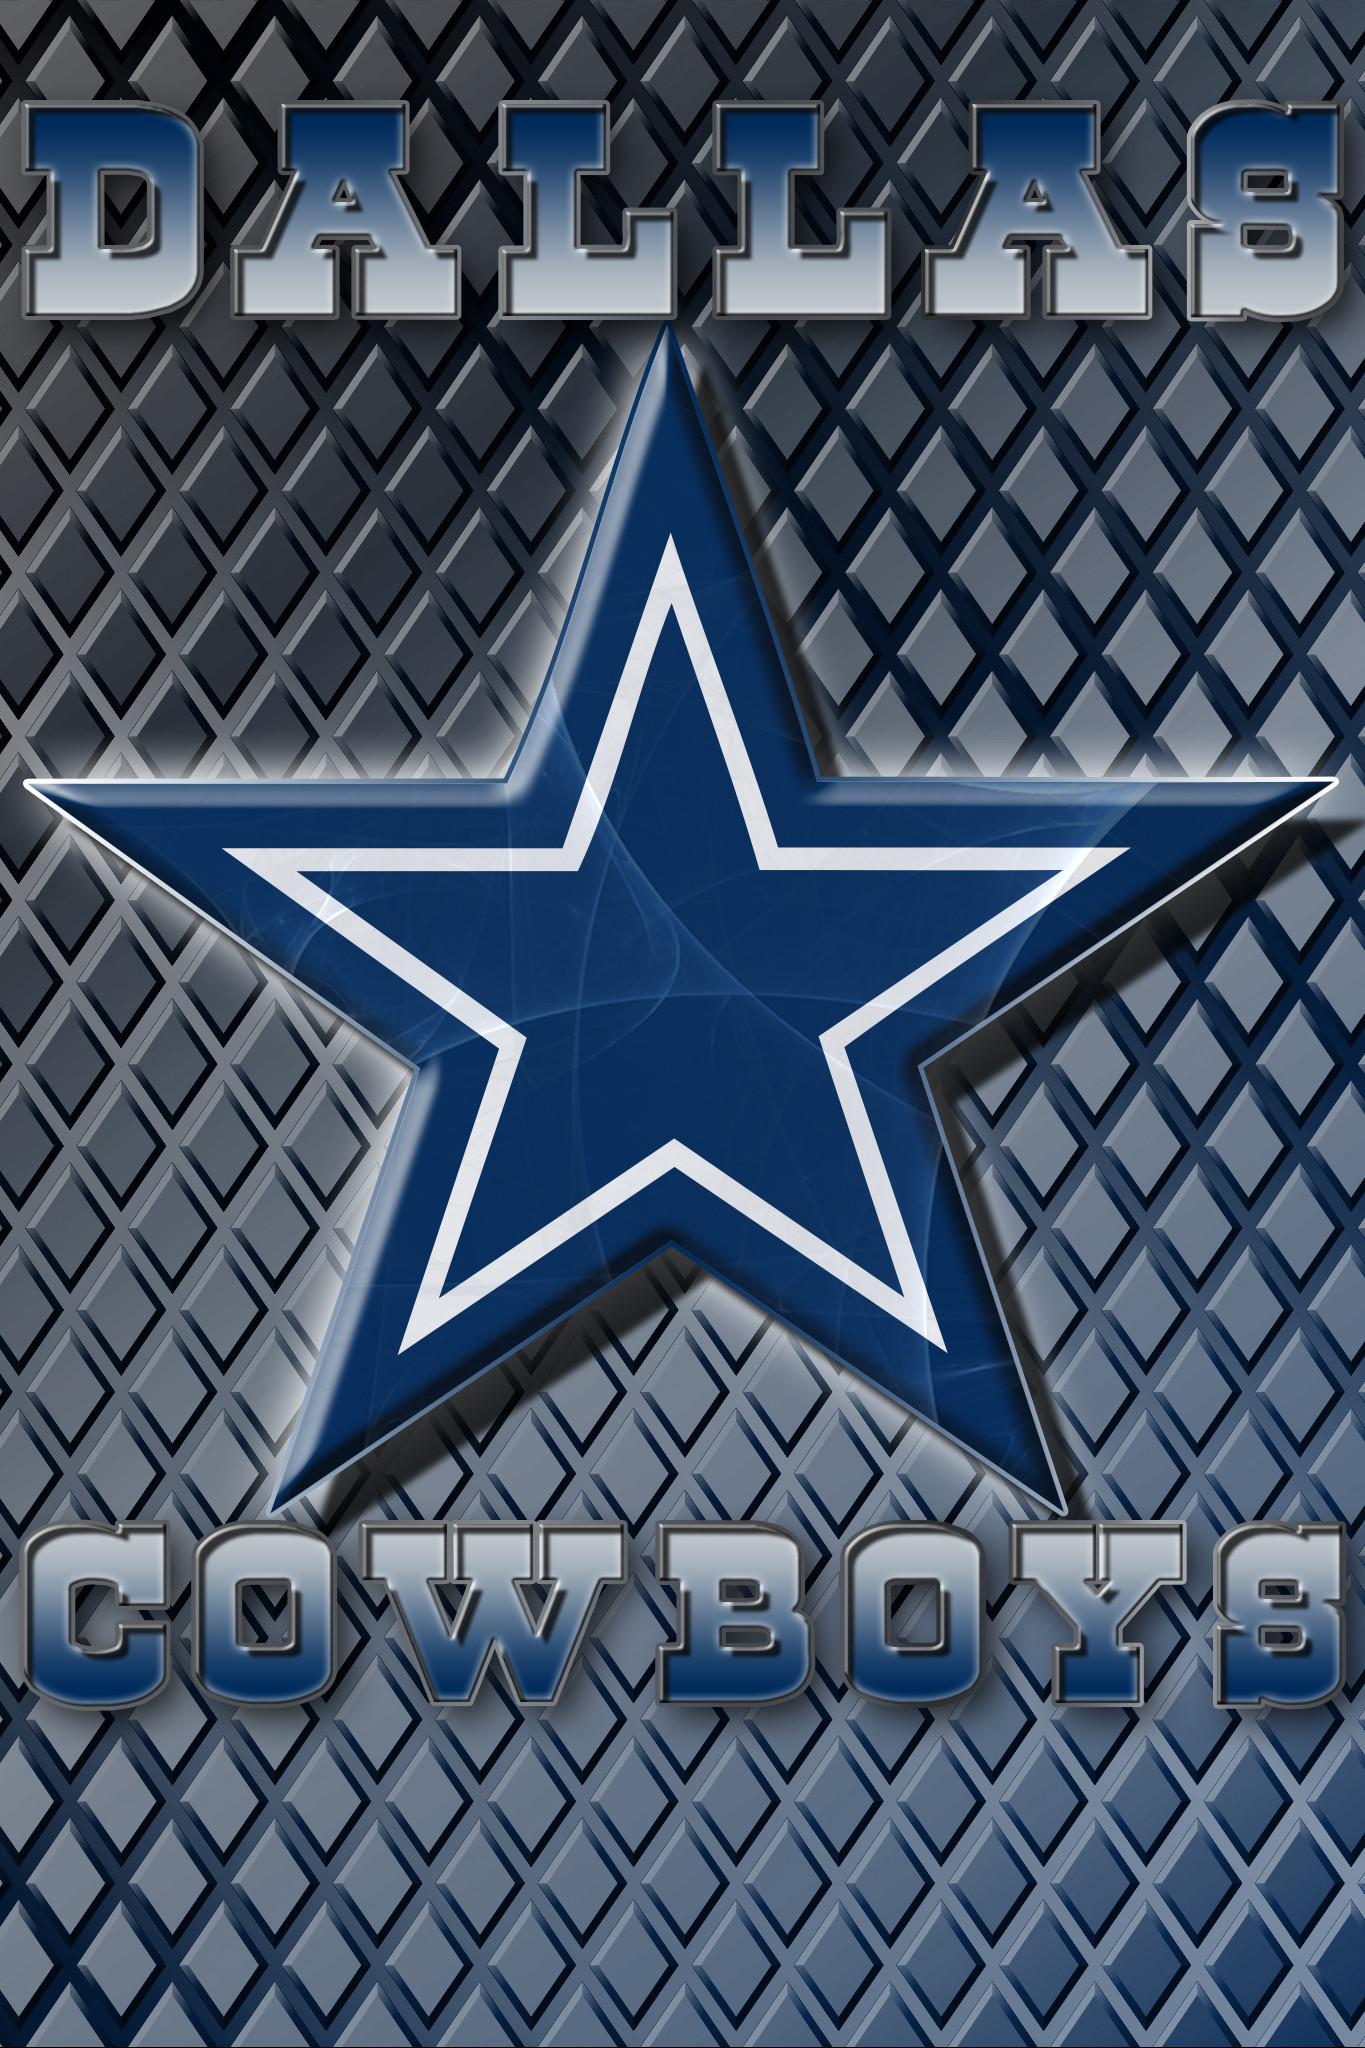 Dallas Cowboys Image Wallpapers Wallpaper